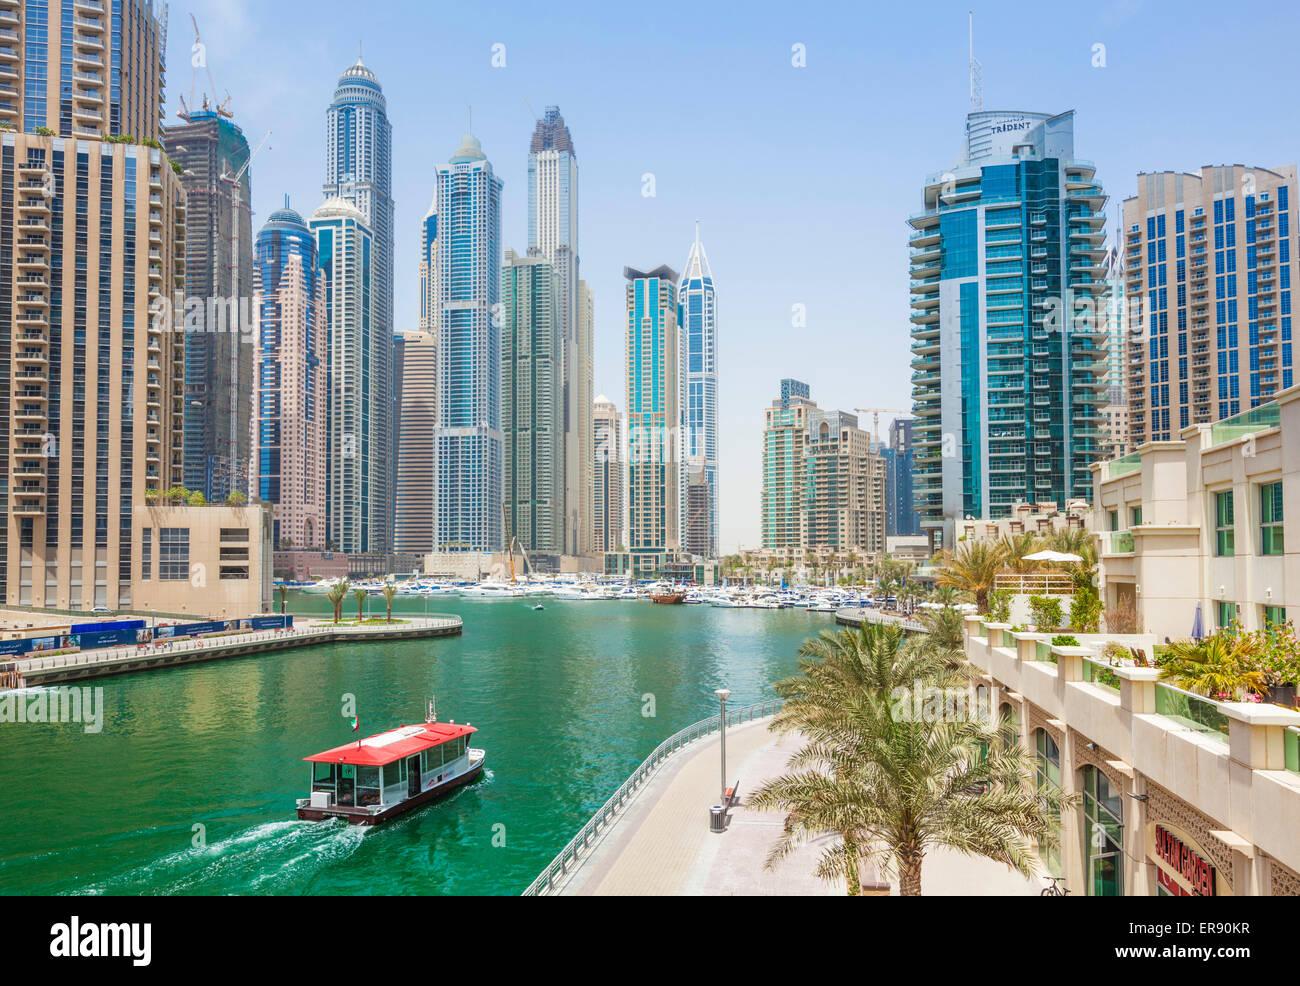 Dubai Marina Skyline and harbour with water taxi Dubai City United Arab Emirates UAE Middle east - Stock Image